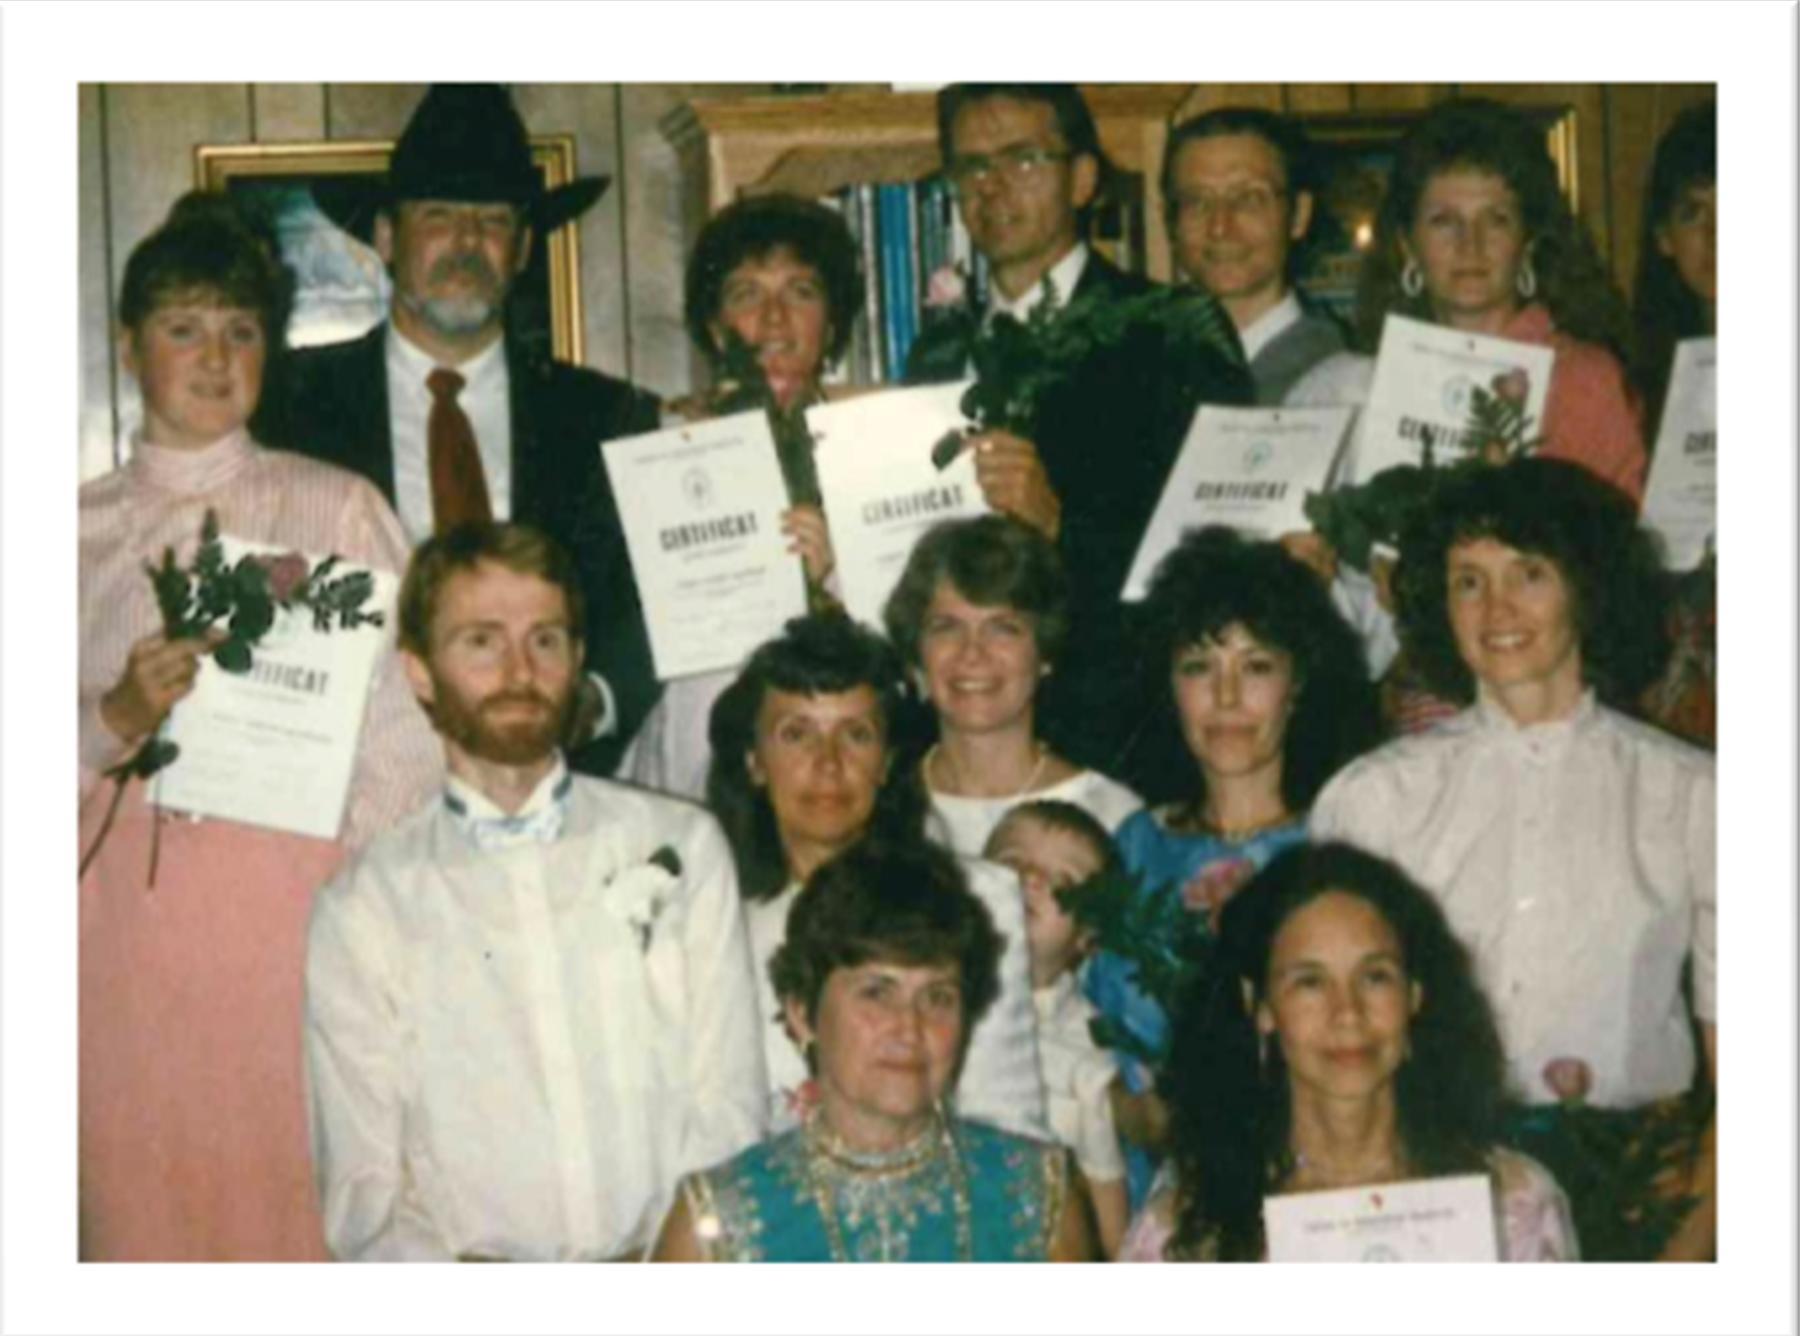 1st Graduating Class in America</br> March 1991</br> Back row: Marita Zachrisson, Charles Ersdal,</br>Tonya Gomman-Swan, Bob Personnette, Jan Johanson,</br>Sherry (last name unknown), Unknown</br> Middle Row: Hans Nordblom, Katri Nordblom,</br>Robin Foline, Joshua Goman (Tonya's son) Mary Jo Morgan,</br>Julie Holdregger</br> Front row: Inbrit Stein, Bernadette Jagiello